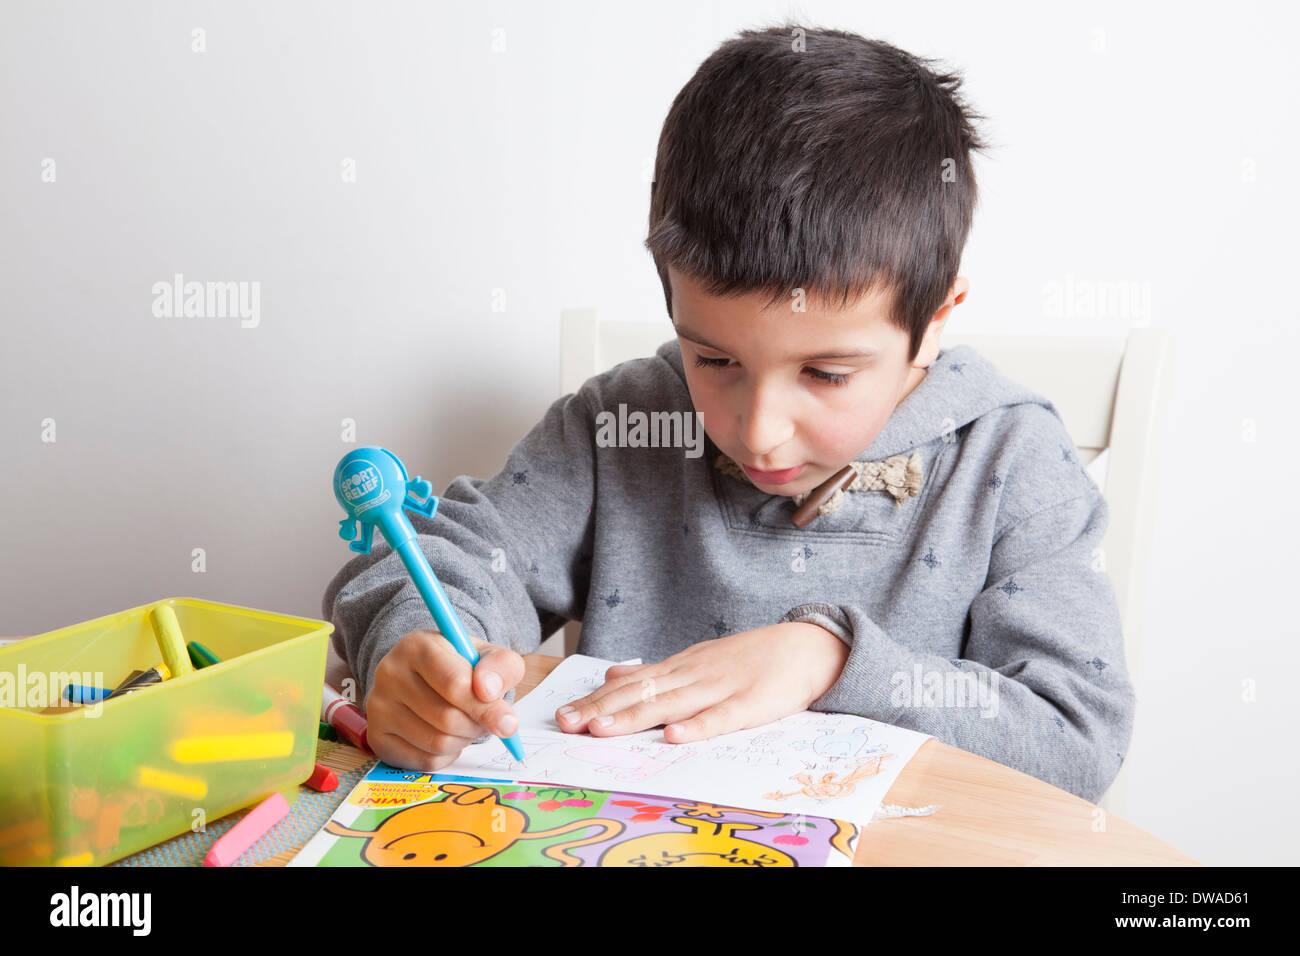 Junge malt ein Bild Stockbild